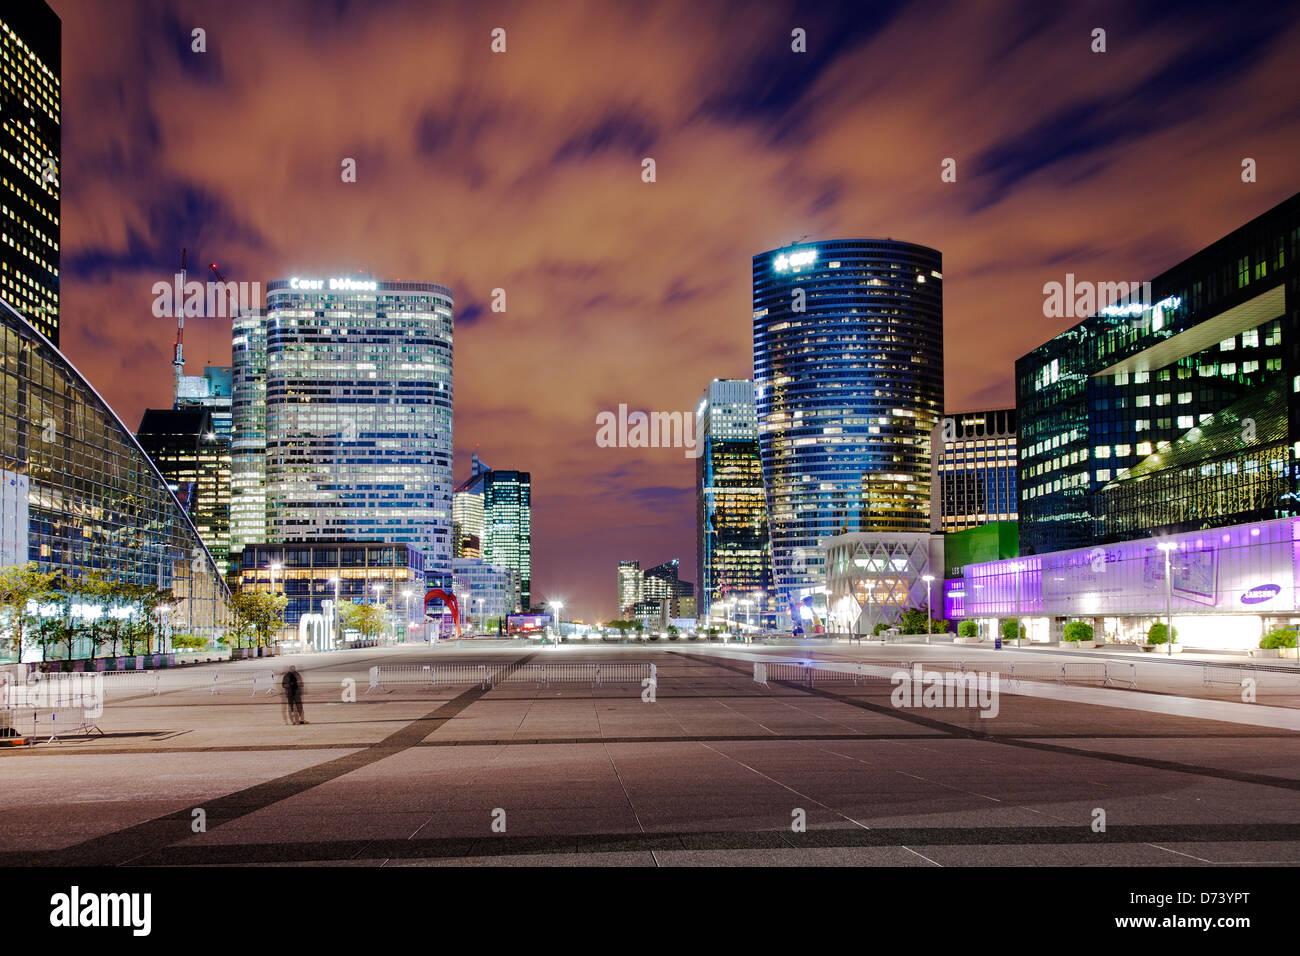 financial district La Défense in Paris at night - Stock Image